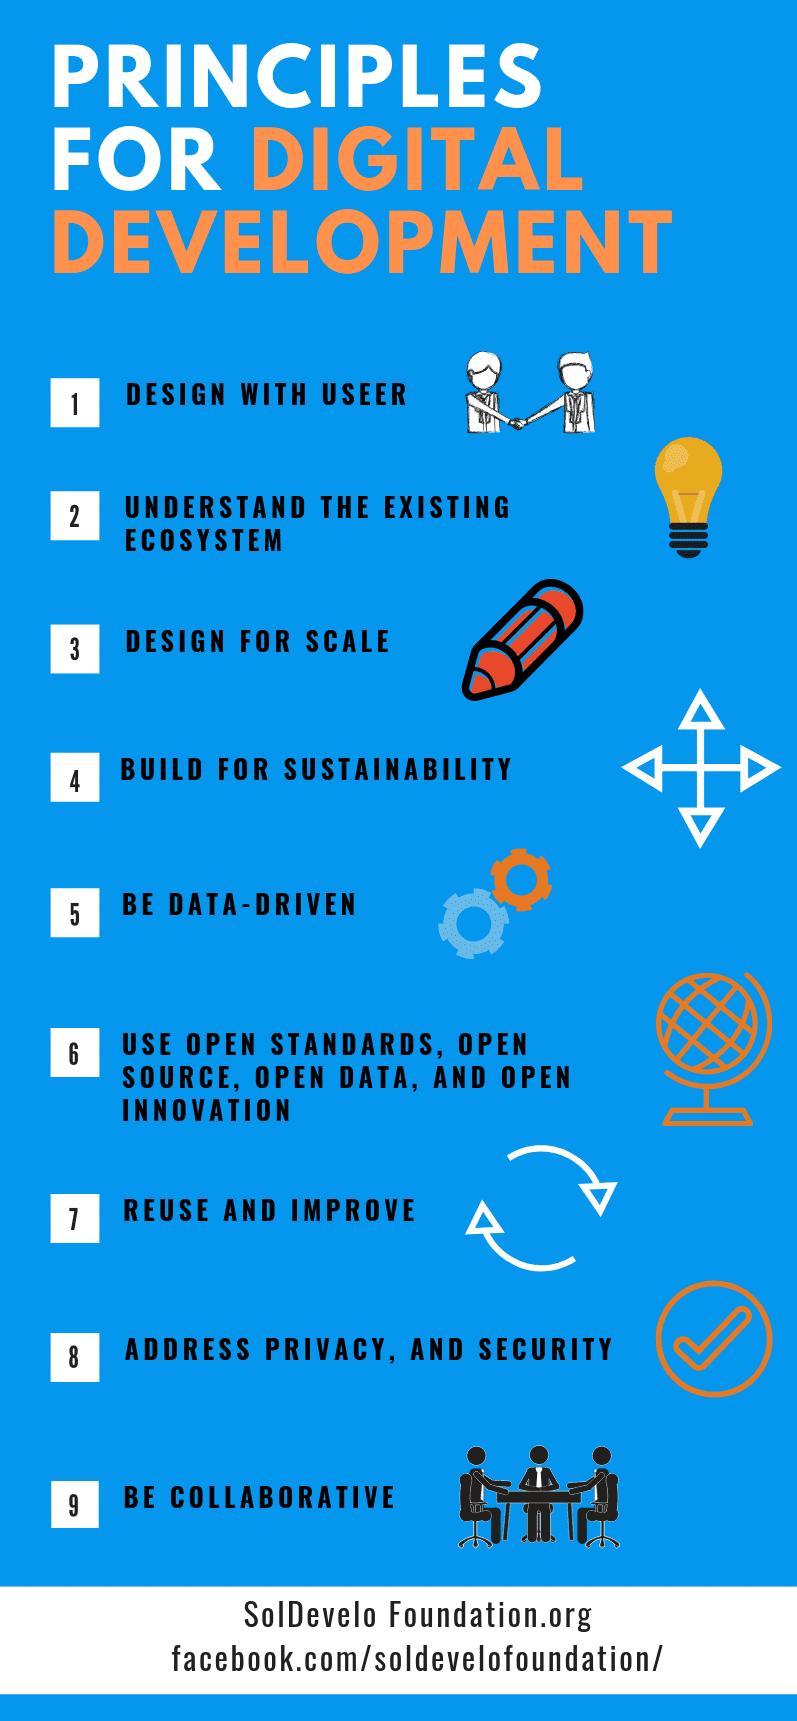 soldevelo foundation, principles for digital development, technology,